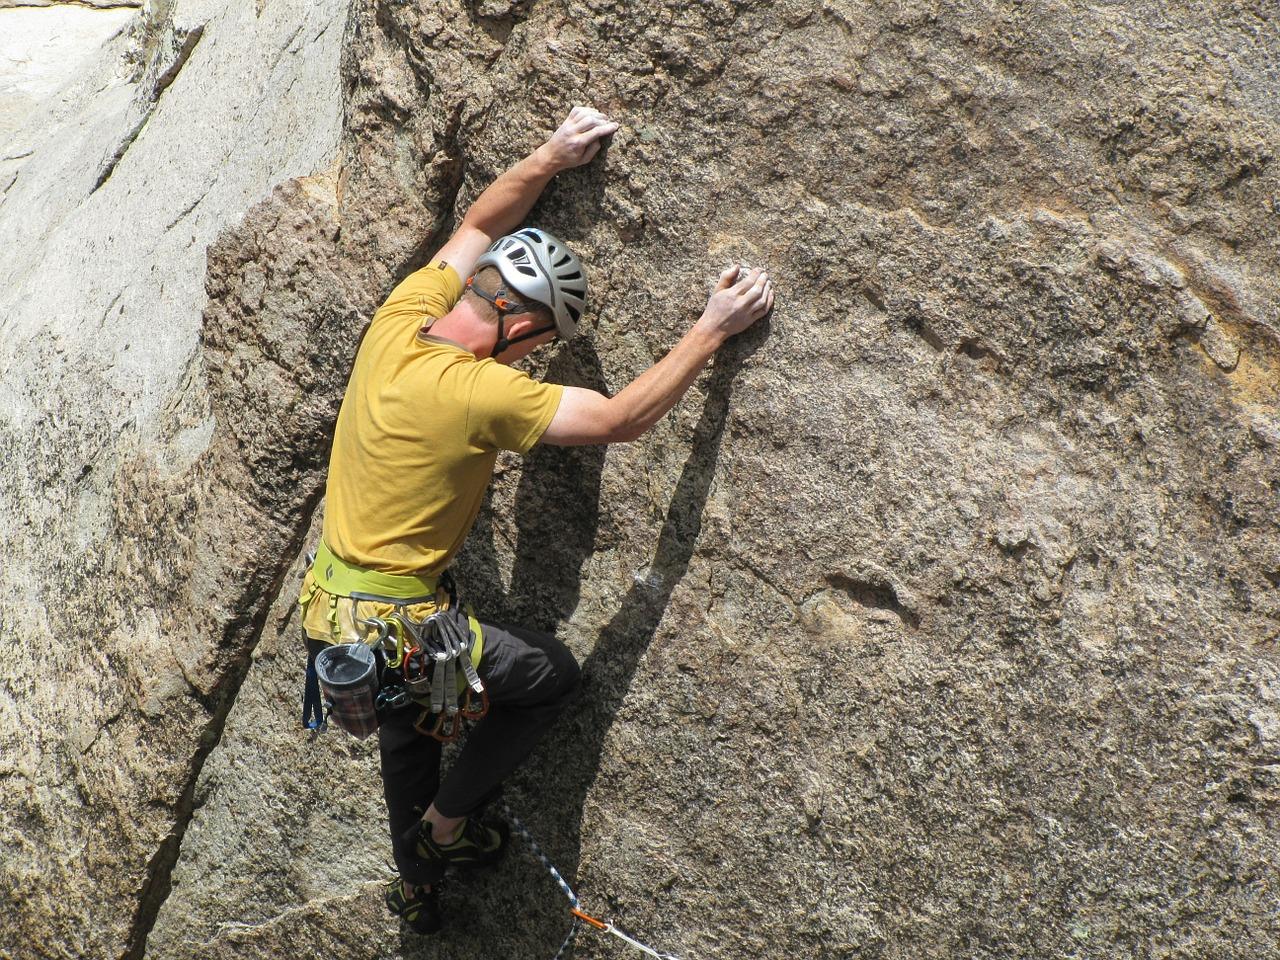 rock-climbing-403487_1280